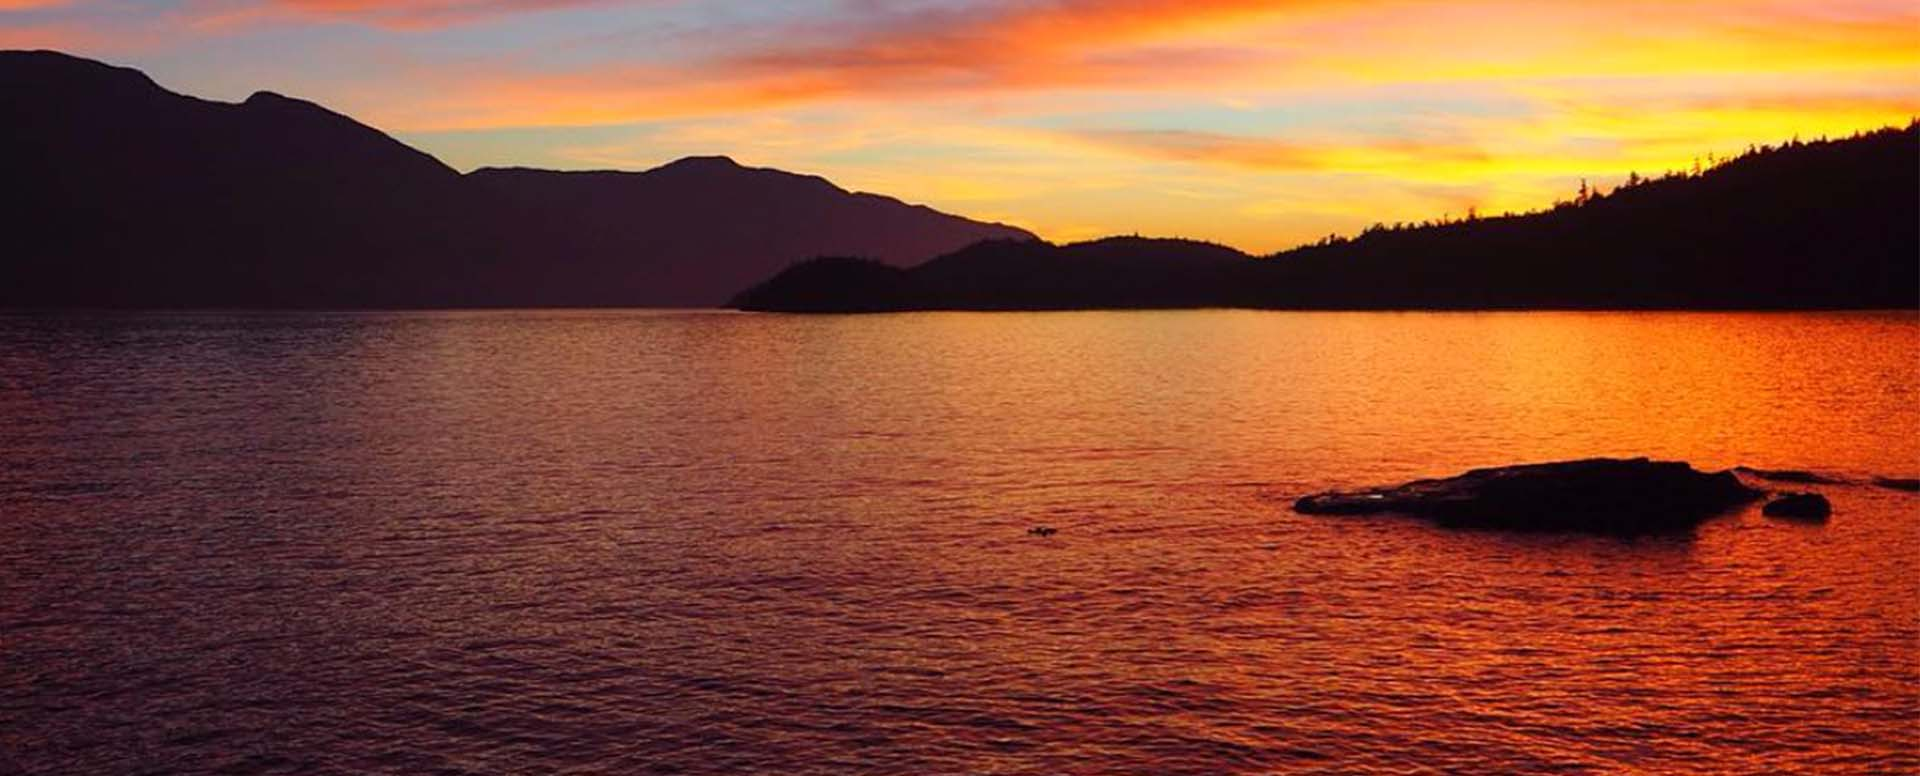 Stunning sunset Johnstone Strait